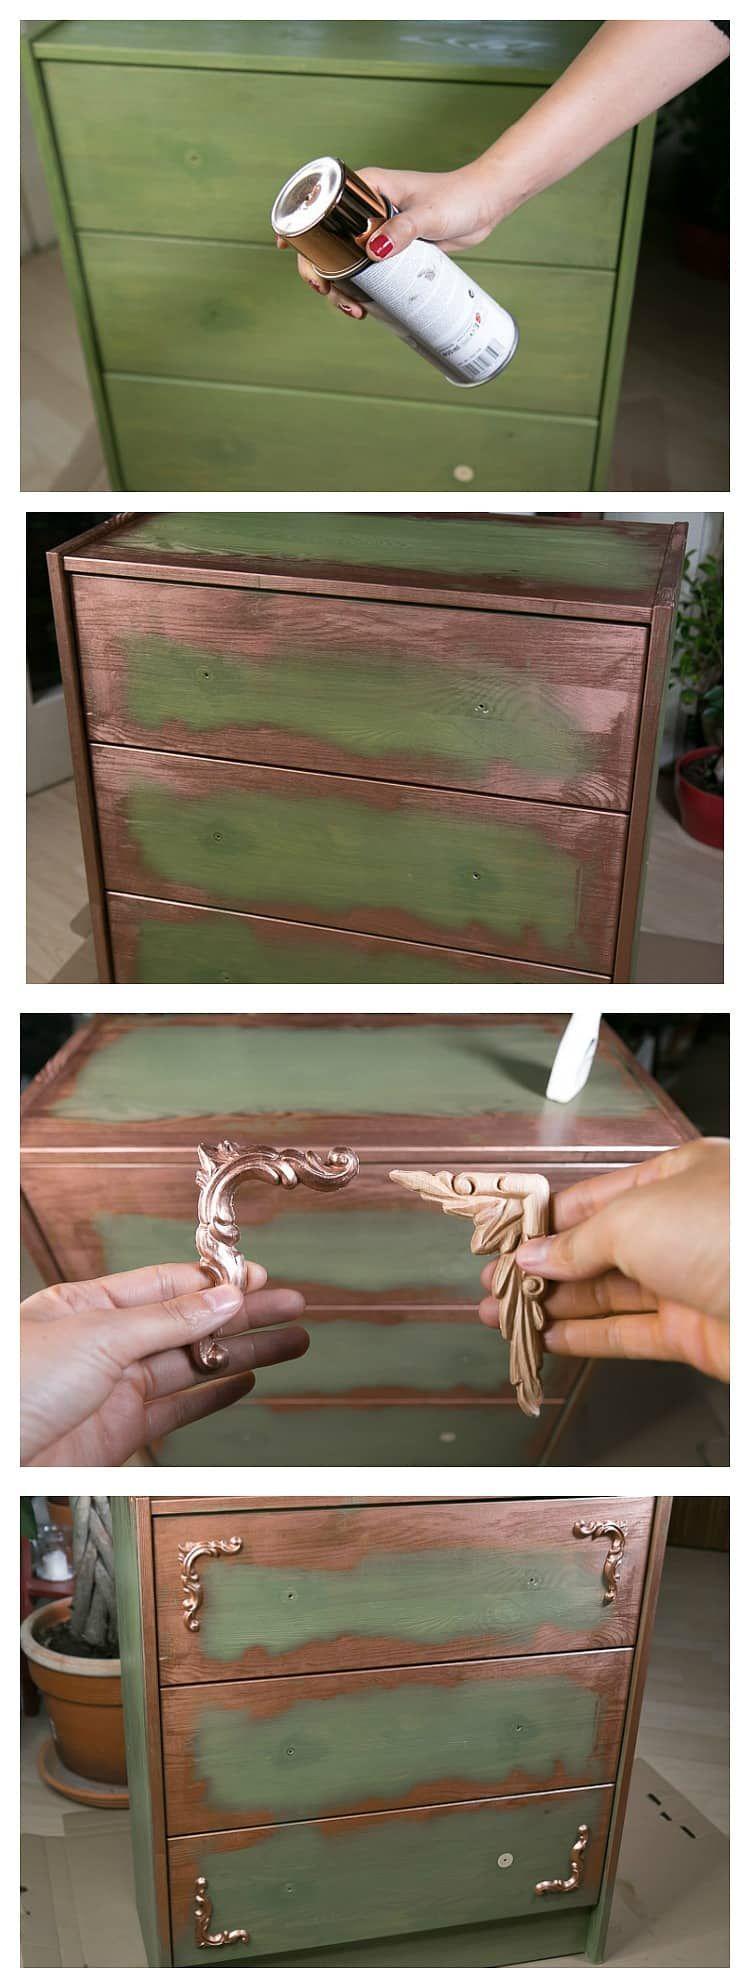 used look m bel selber machen kreativ und individuell m bel umgestalten anleitung. Black Bedroom Furniture Sets. Home Design Ideas